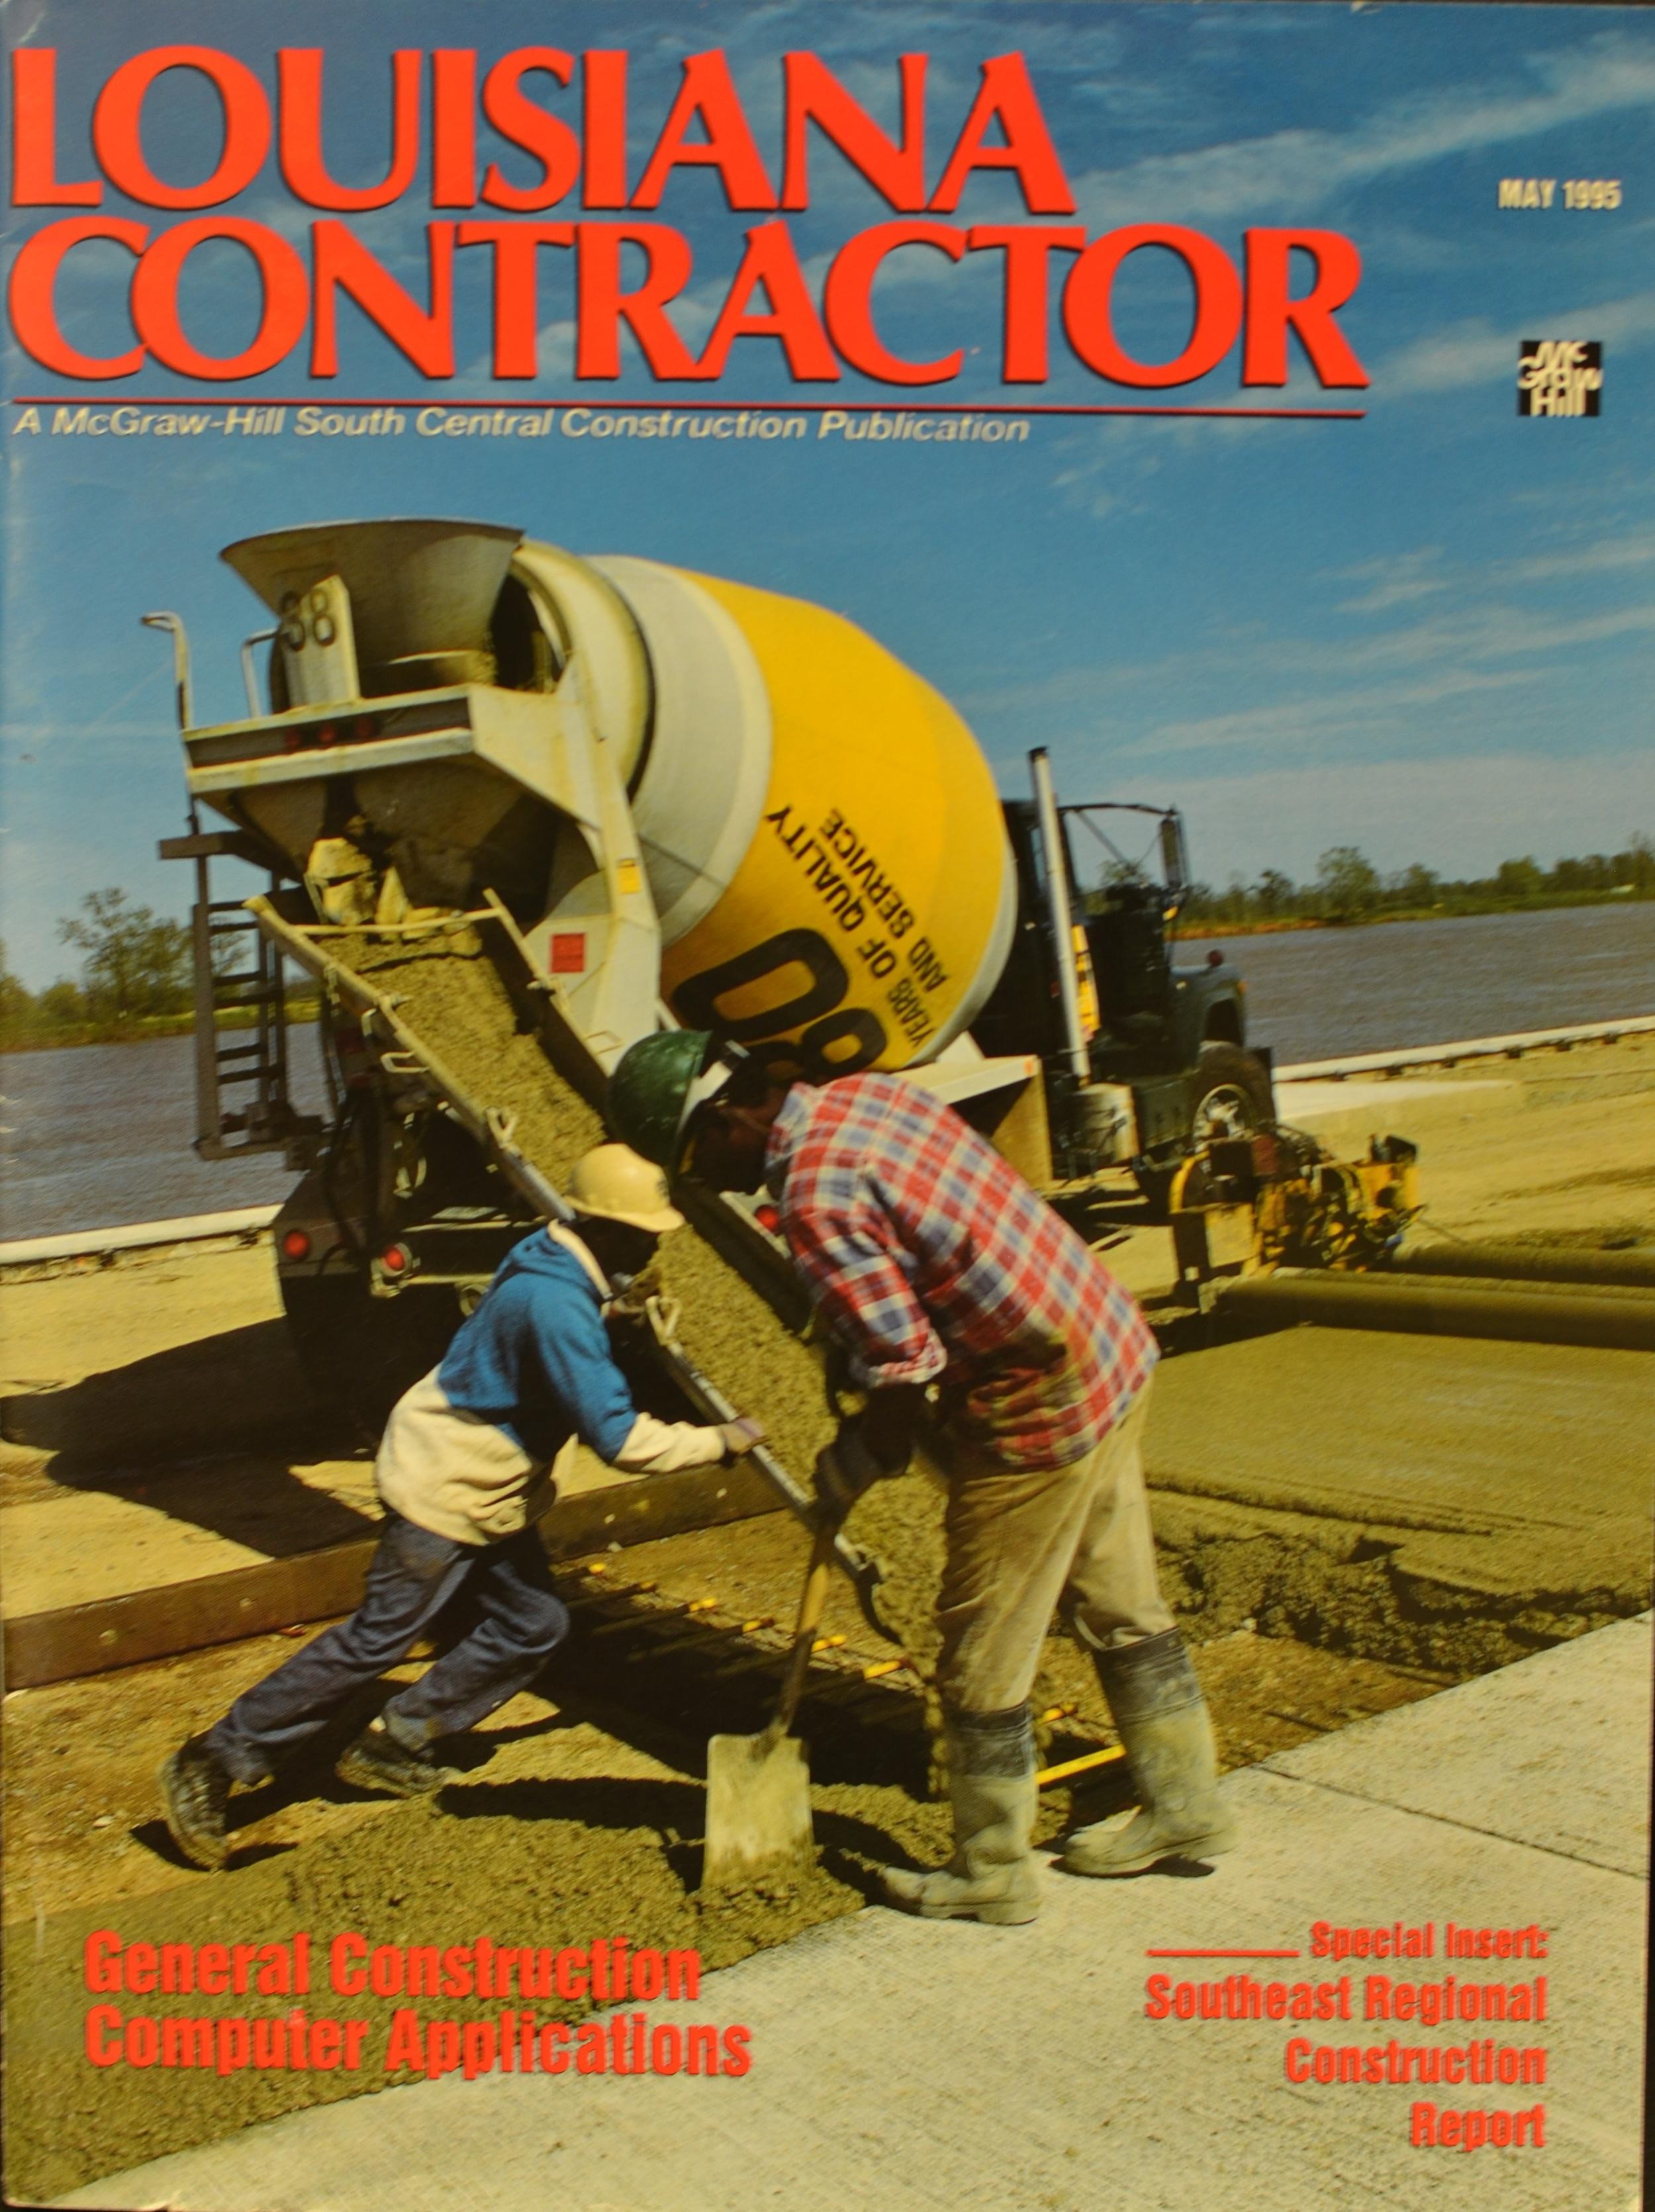 Louisiana Contractor 1995.jpg